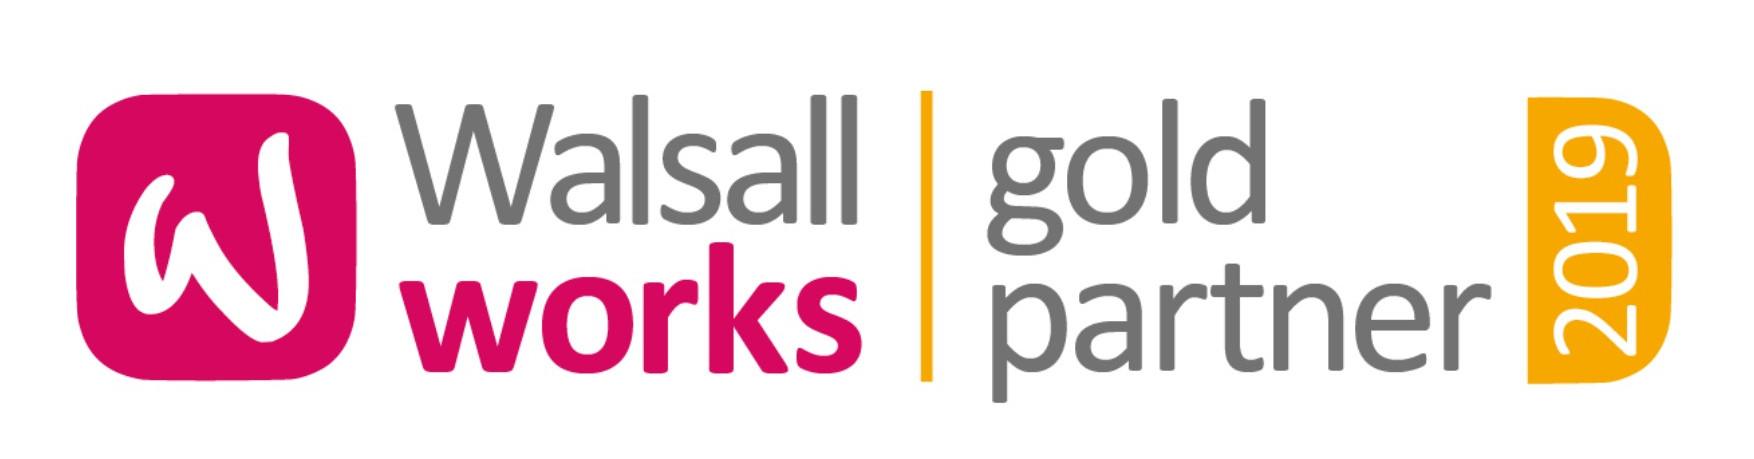 Walsall Works Gold Partner Award